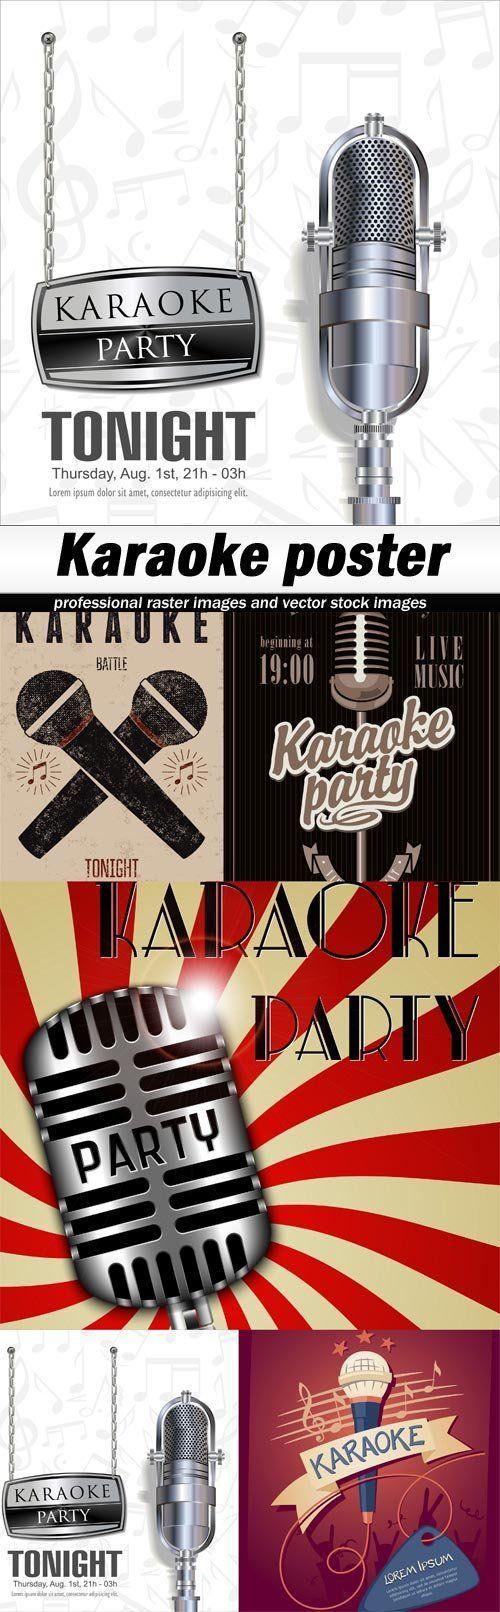 Karaoke poster-5xEPS